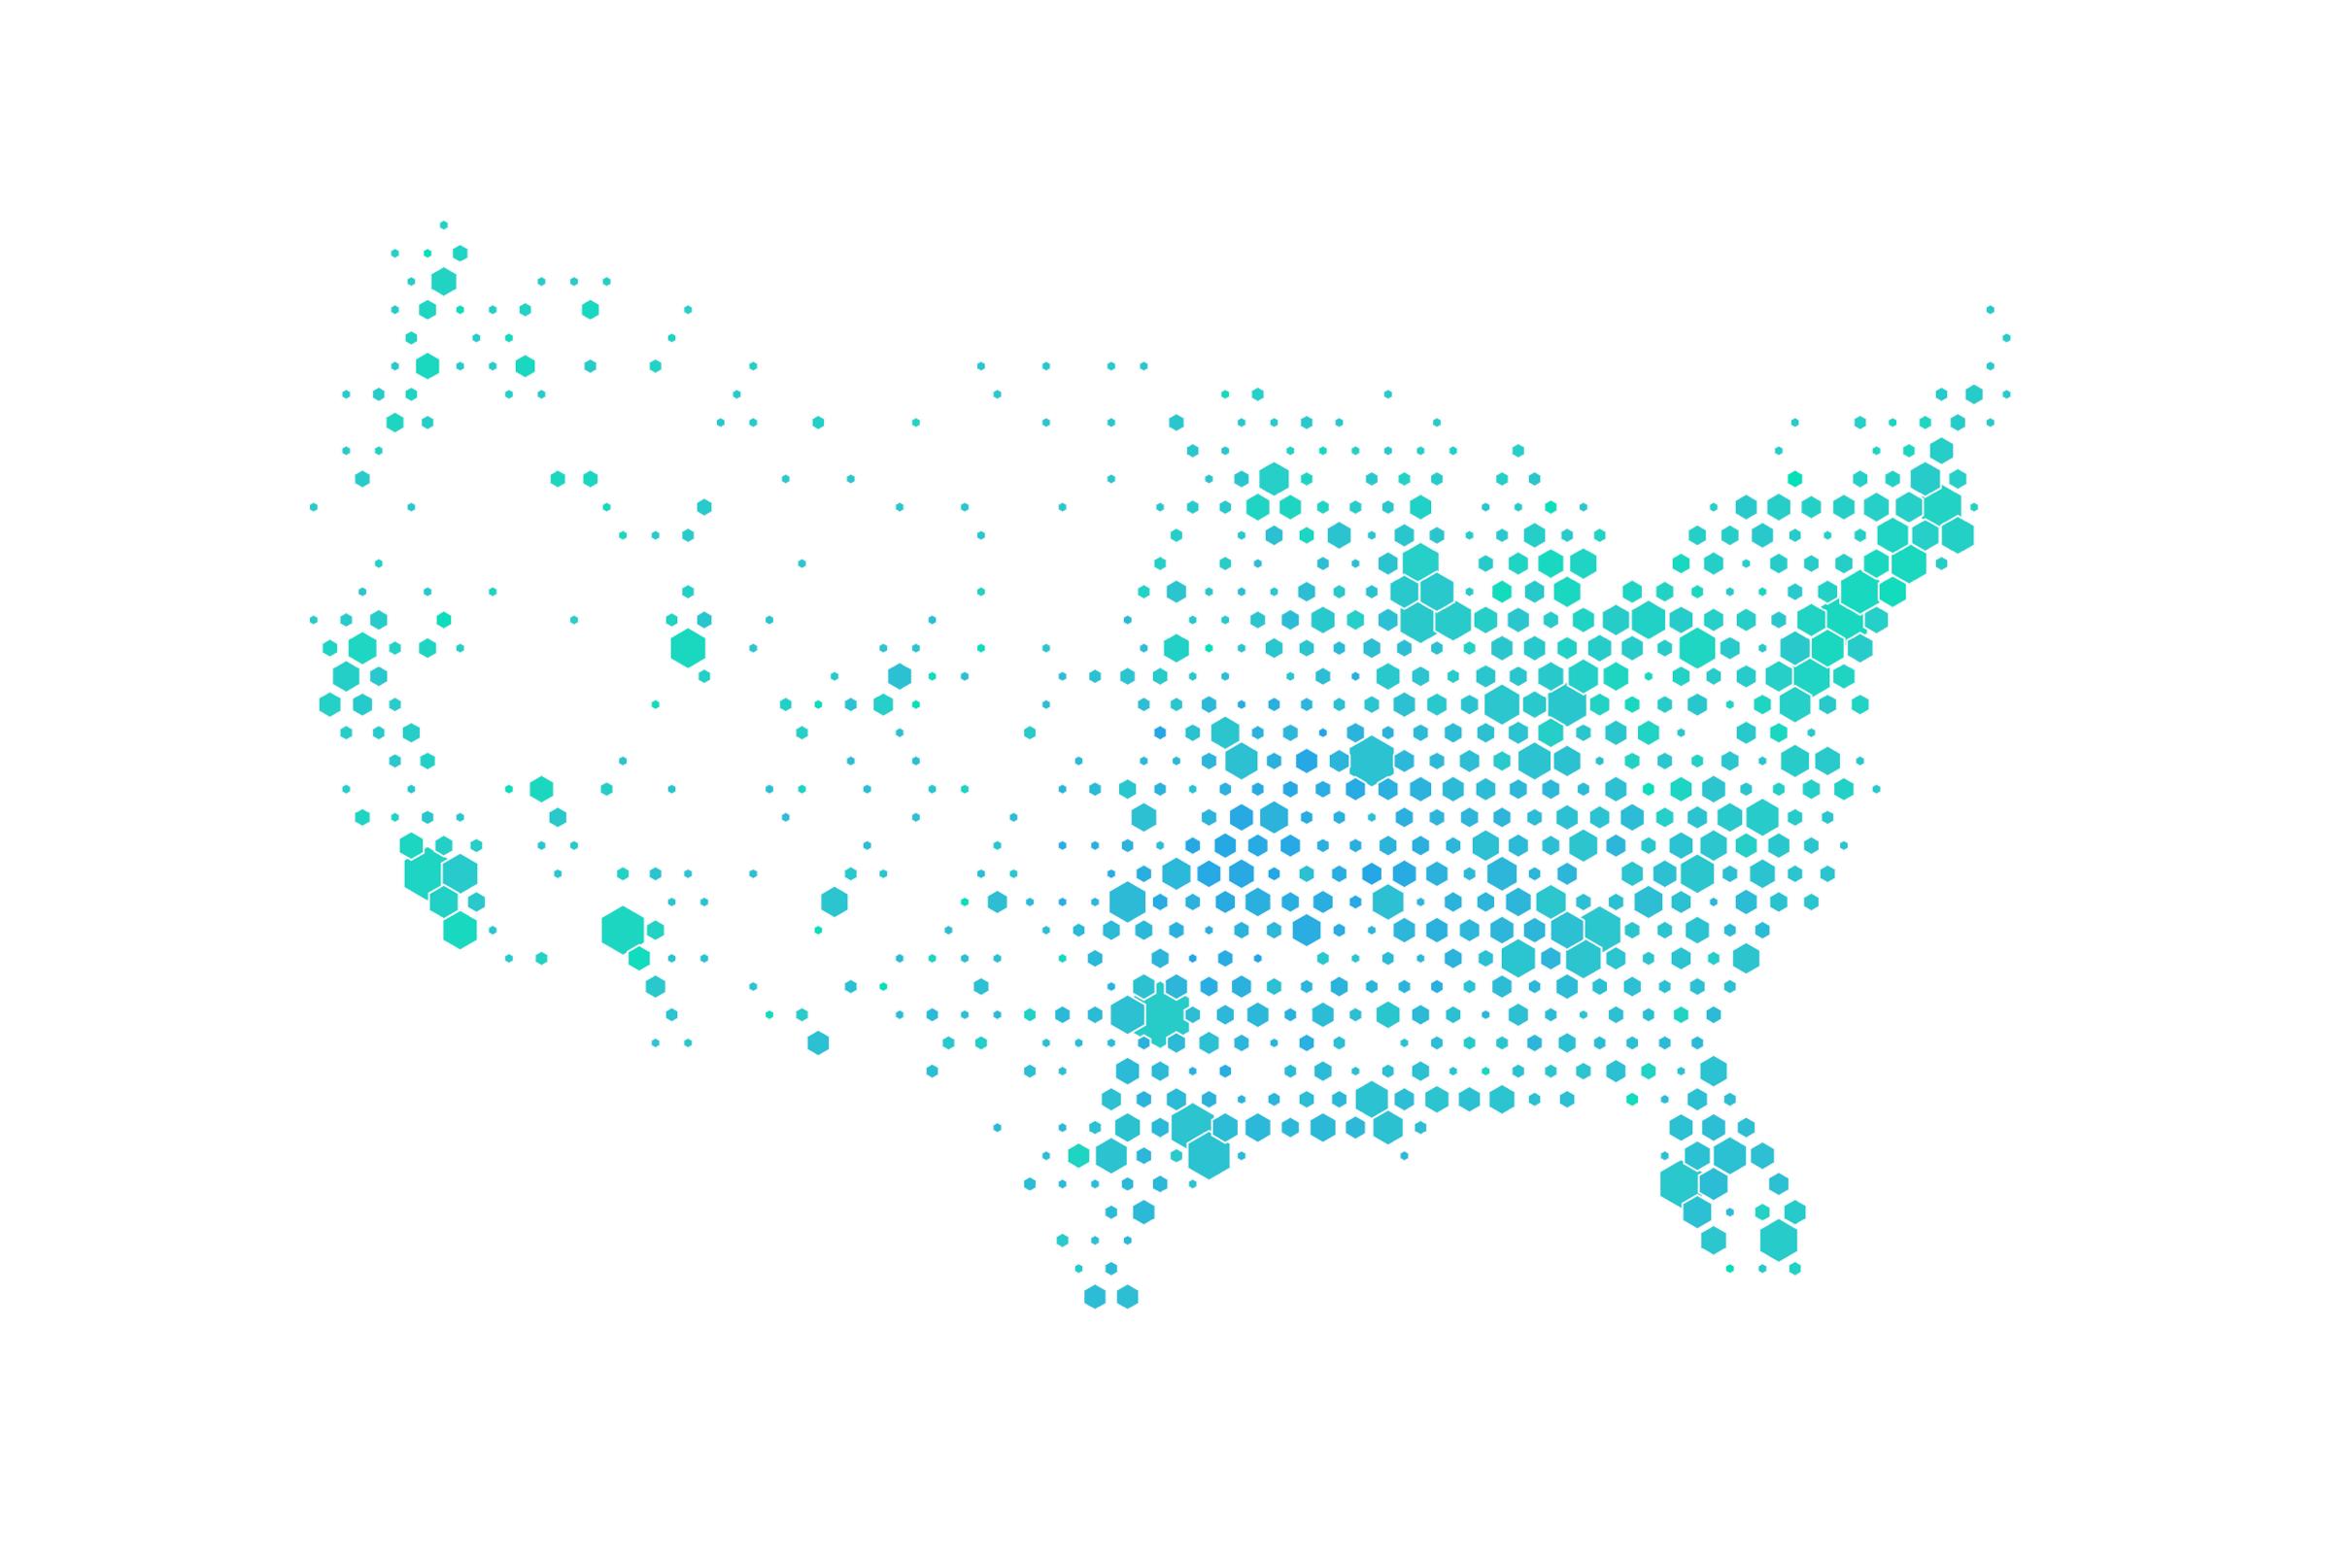 Geographic Data Visualization